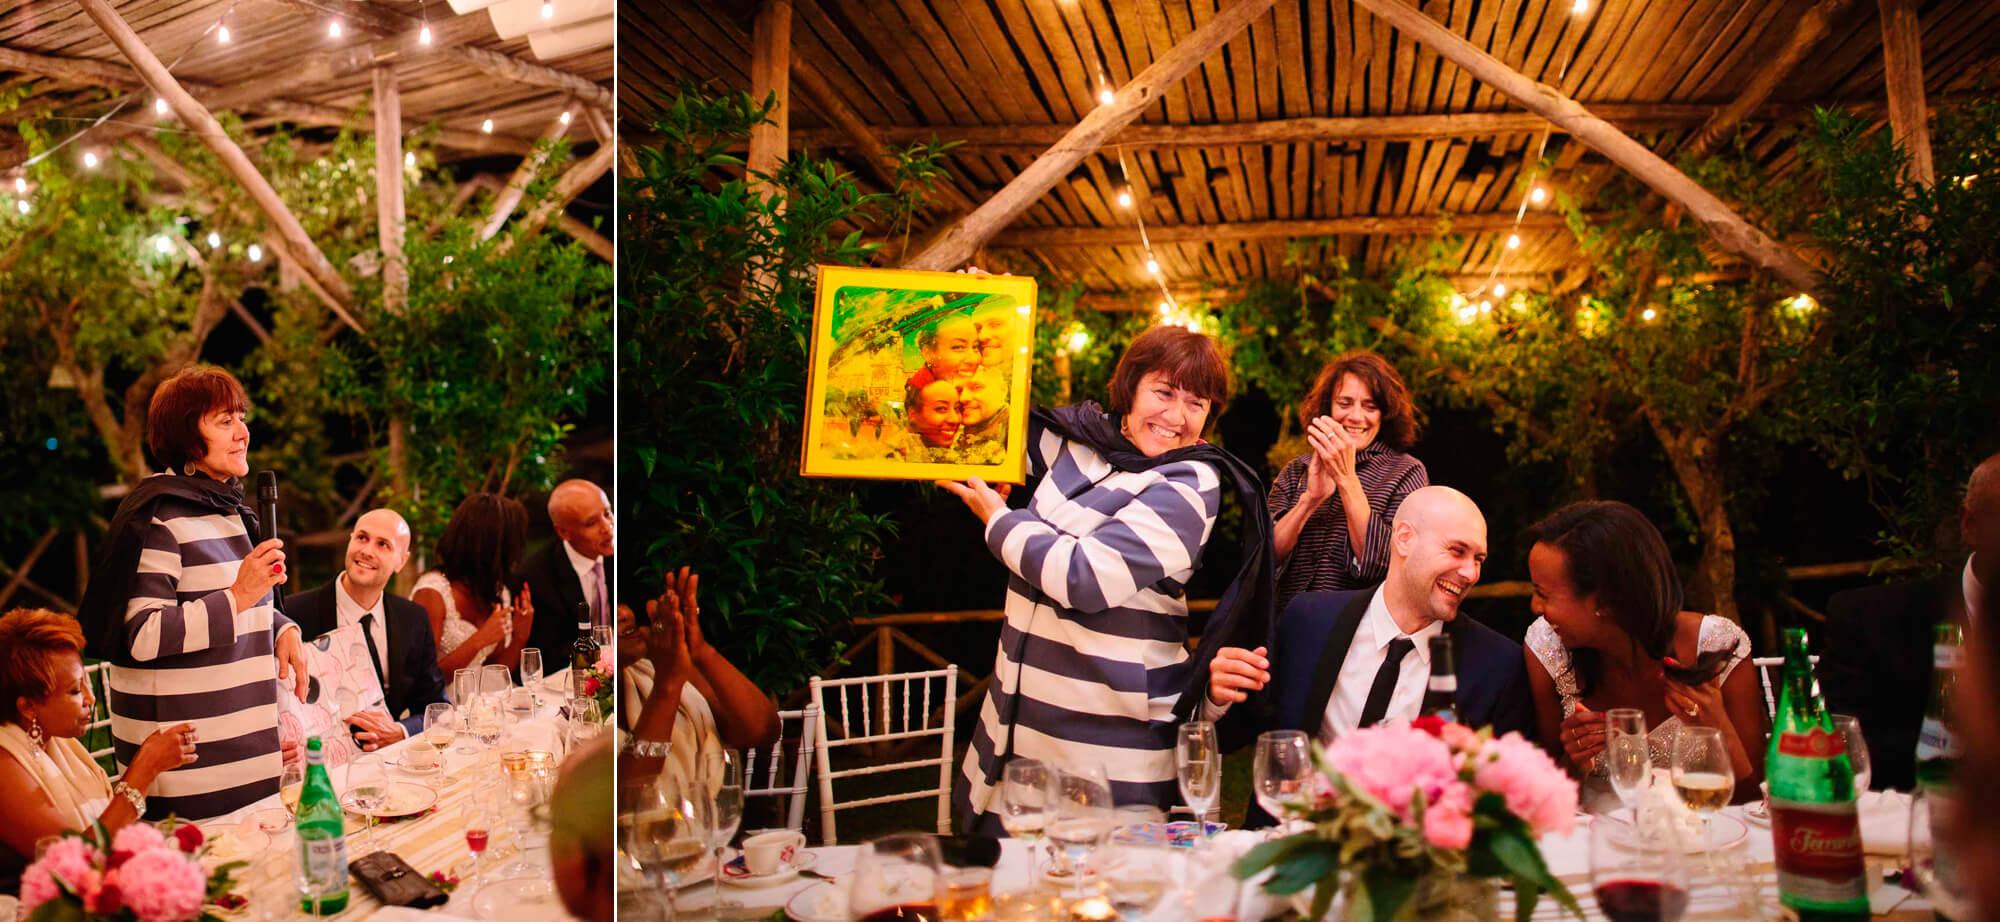 154-sorrento-wedding-photographer.jpg